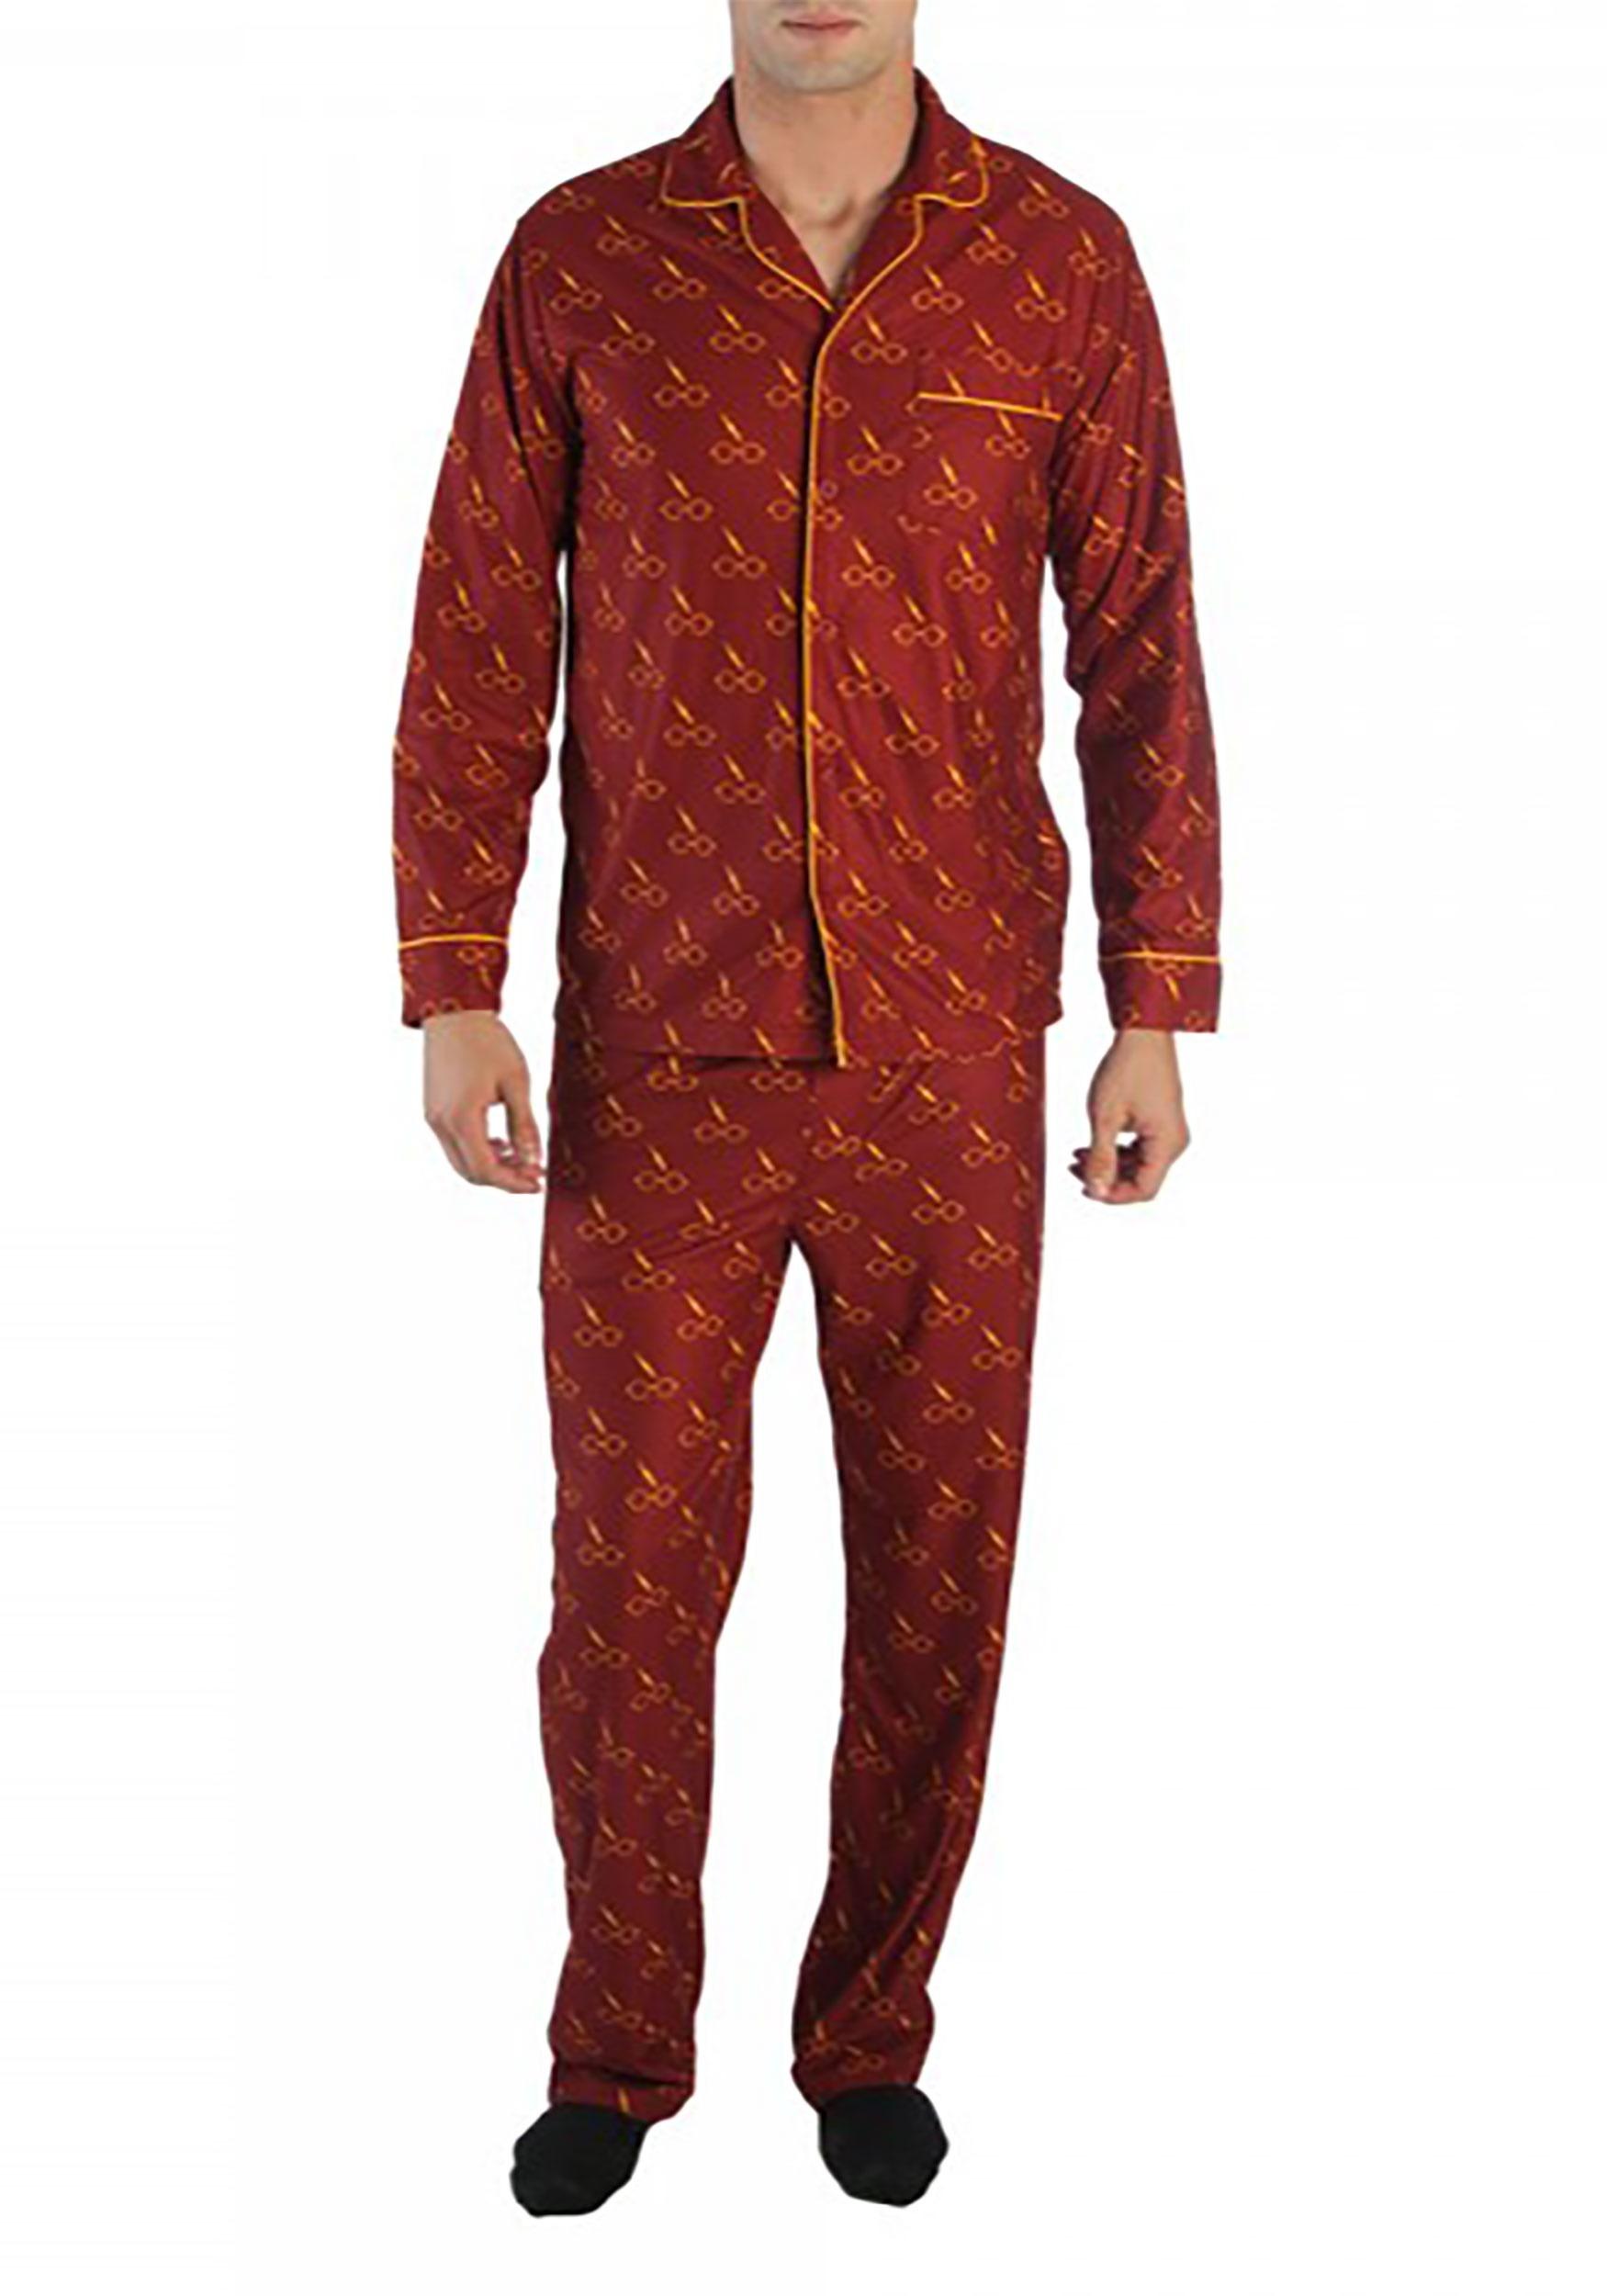 232fe6951866 Men s Harry Potter All Over Print Pajama Shirt and Pants Set